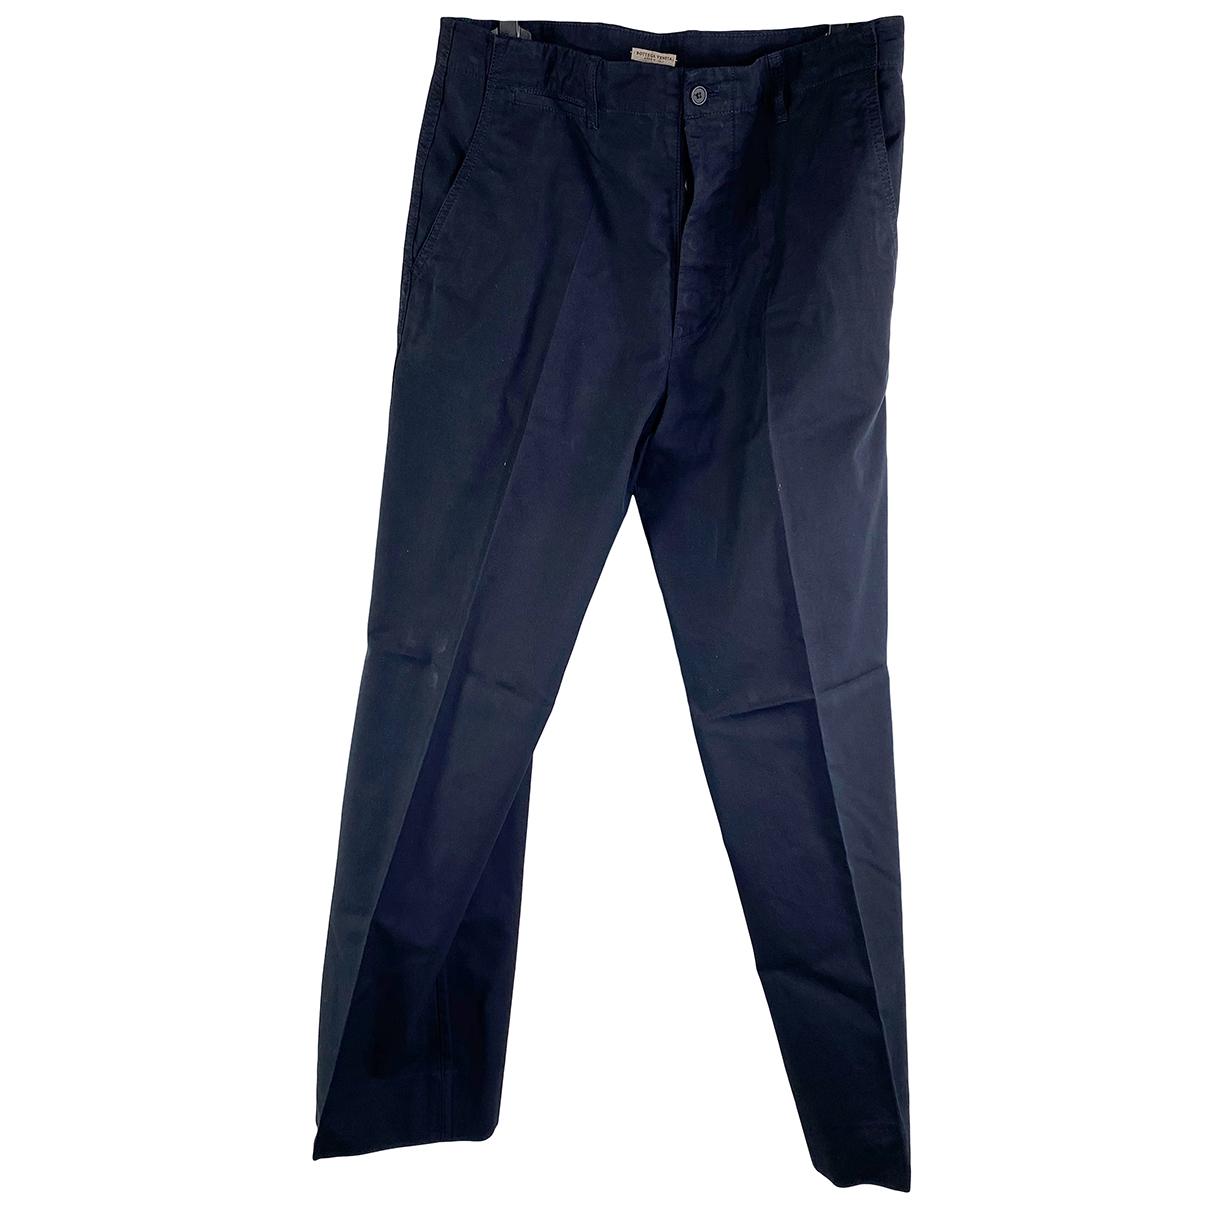 Bottega Veneta \N Black Cotton Trousers for Women 44 IT